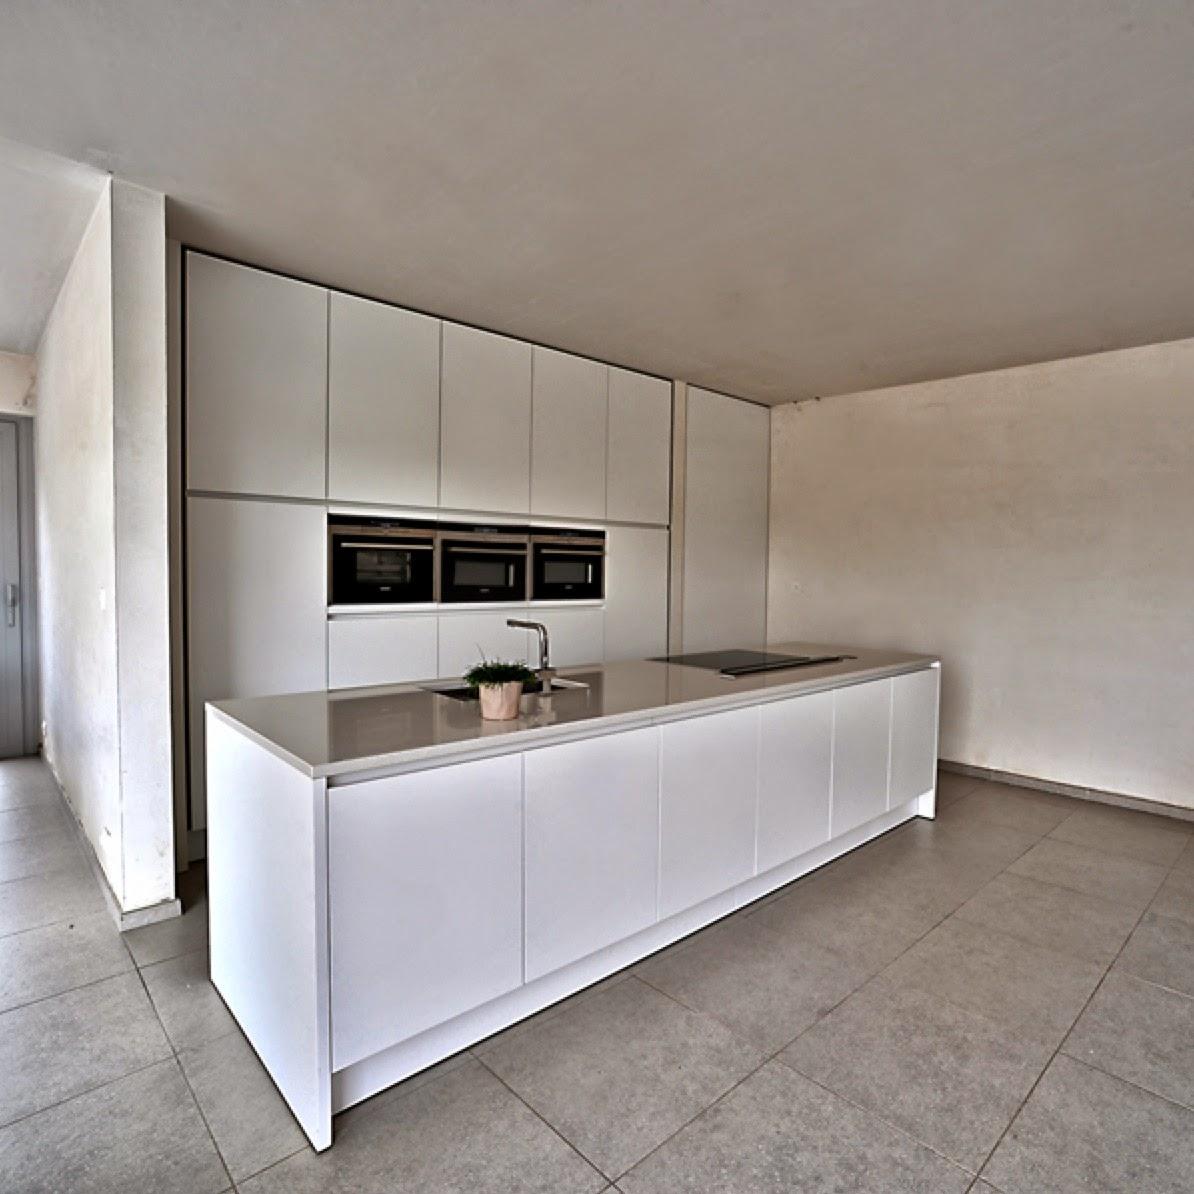 Realisatie interieur moderne keukens interieurbouw claesen gunther bilzen - Dimensie centraal keuken eiland ...